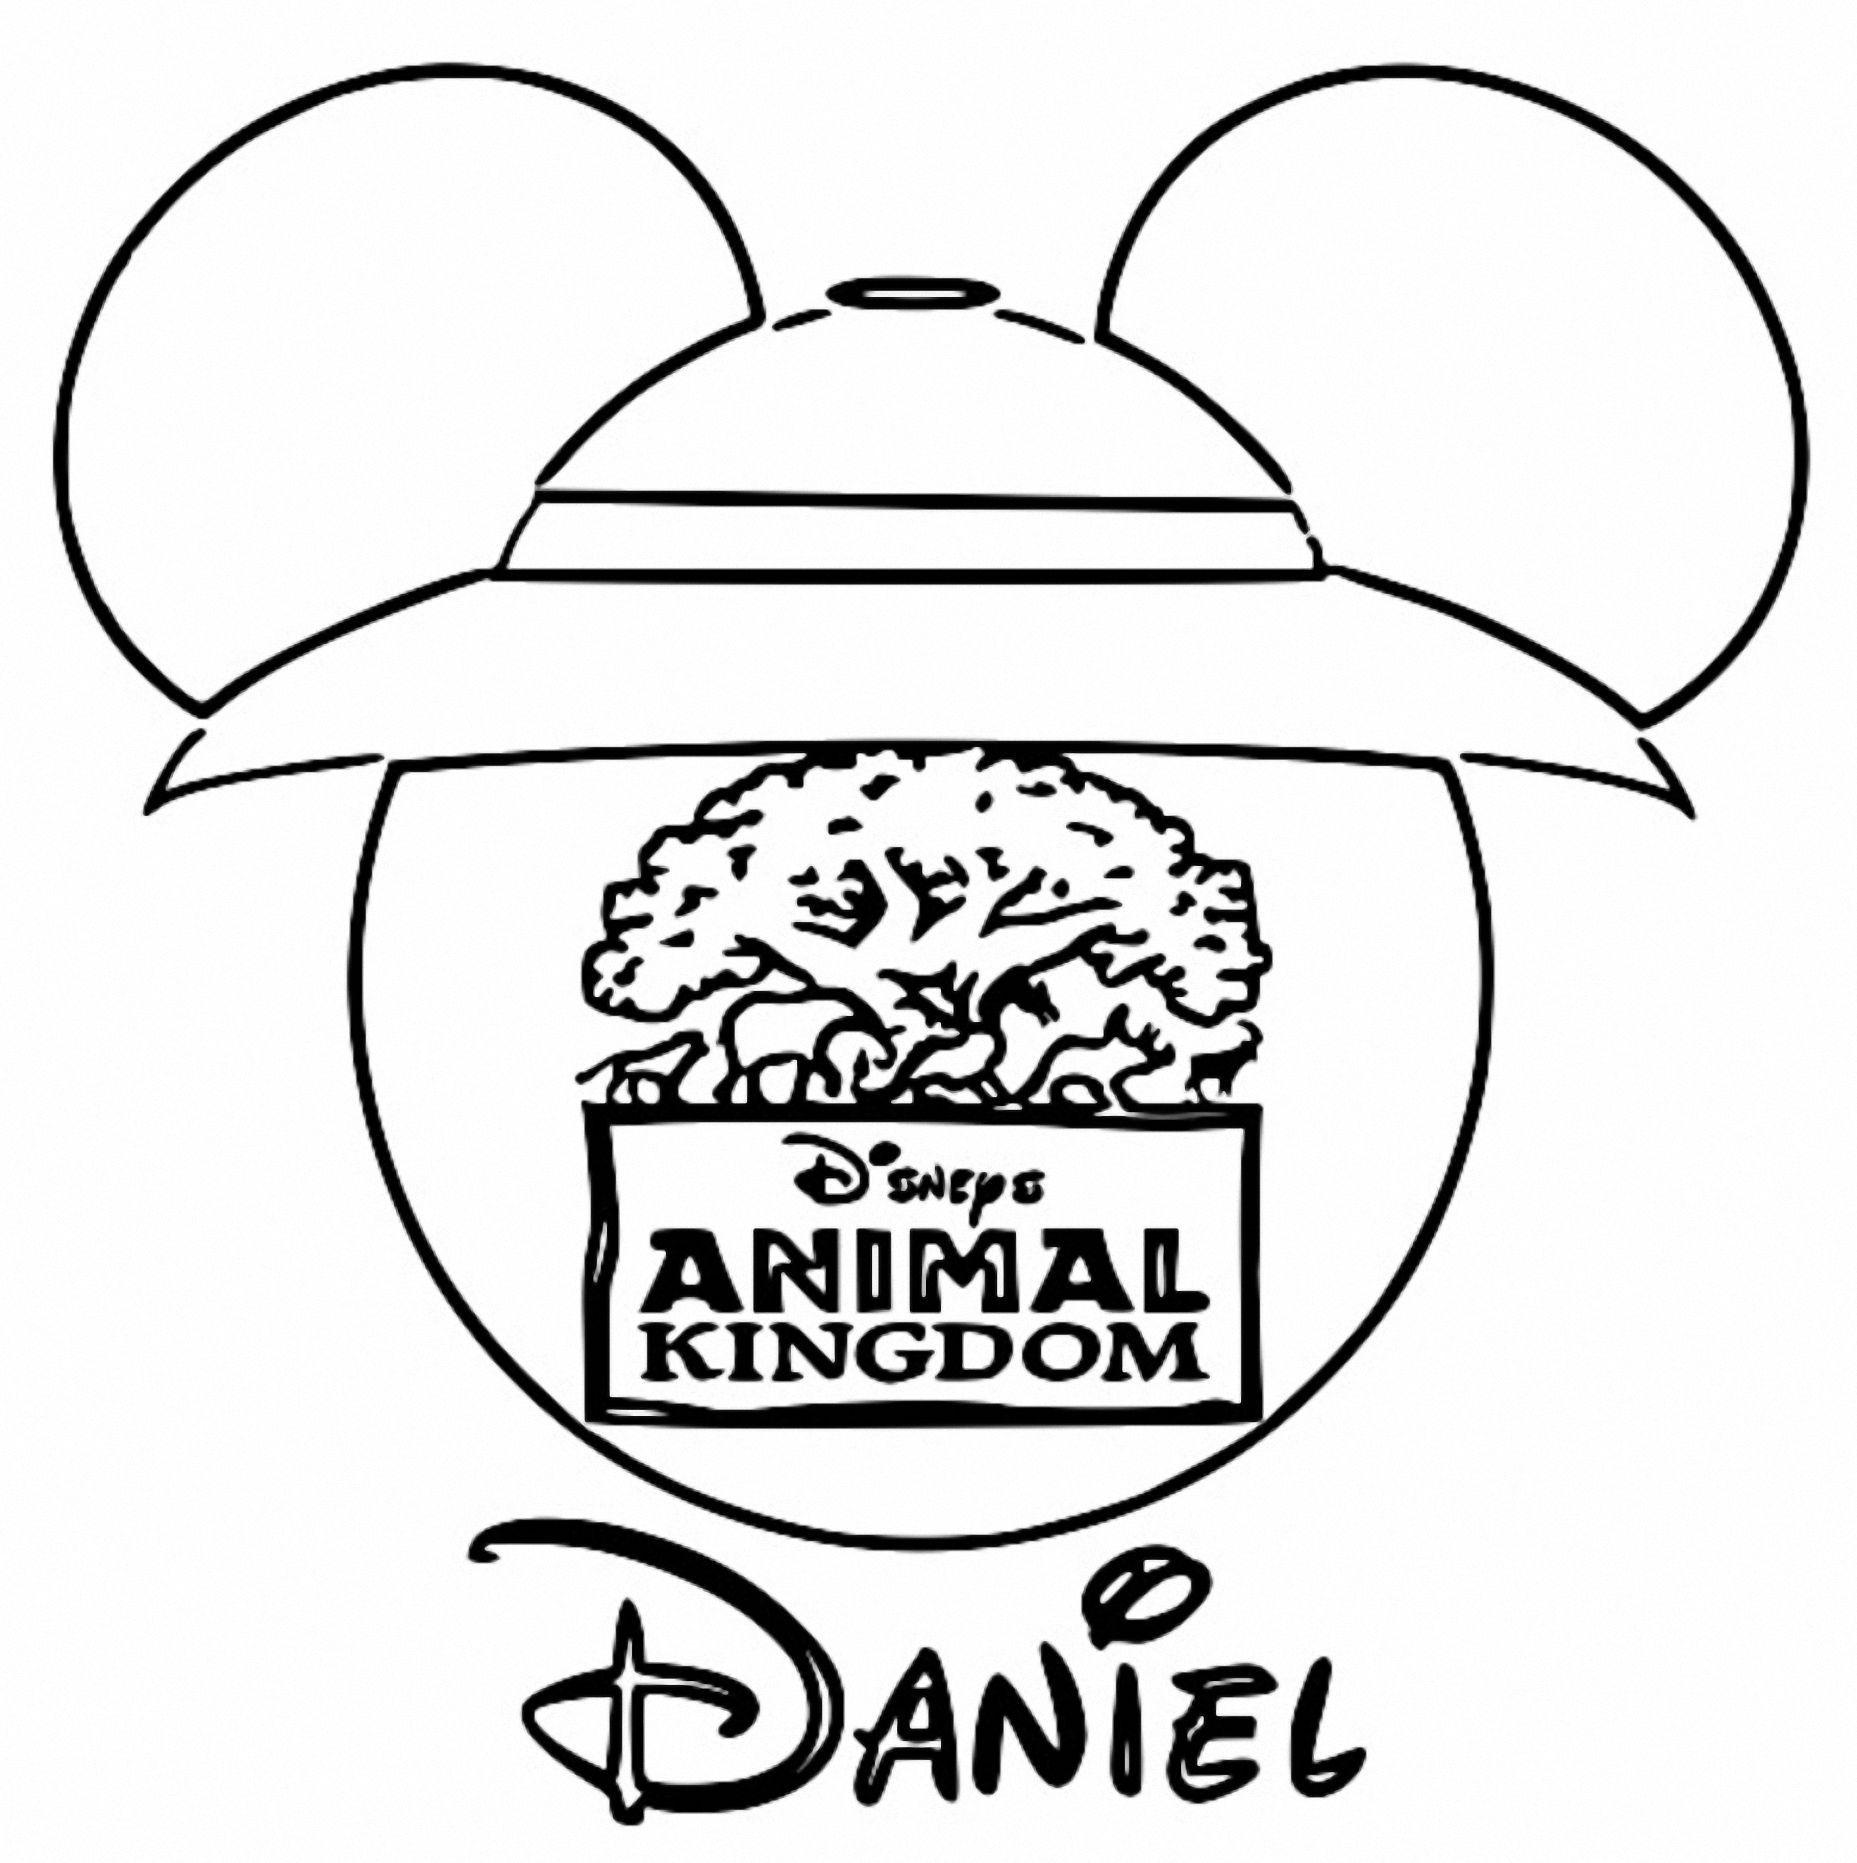 animal kingdom coloring pages | Disney Animal Kingdom Coloring Pages - Coloring Home